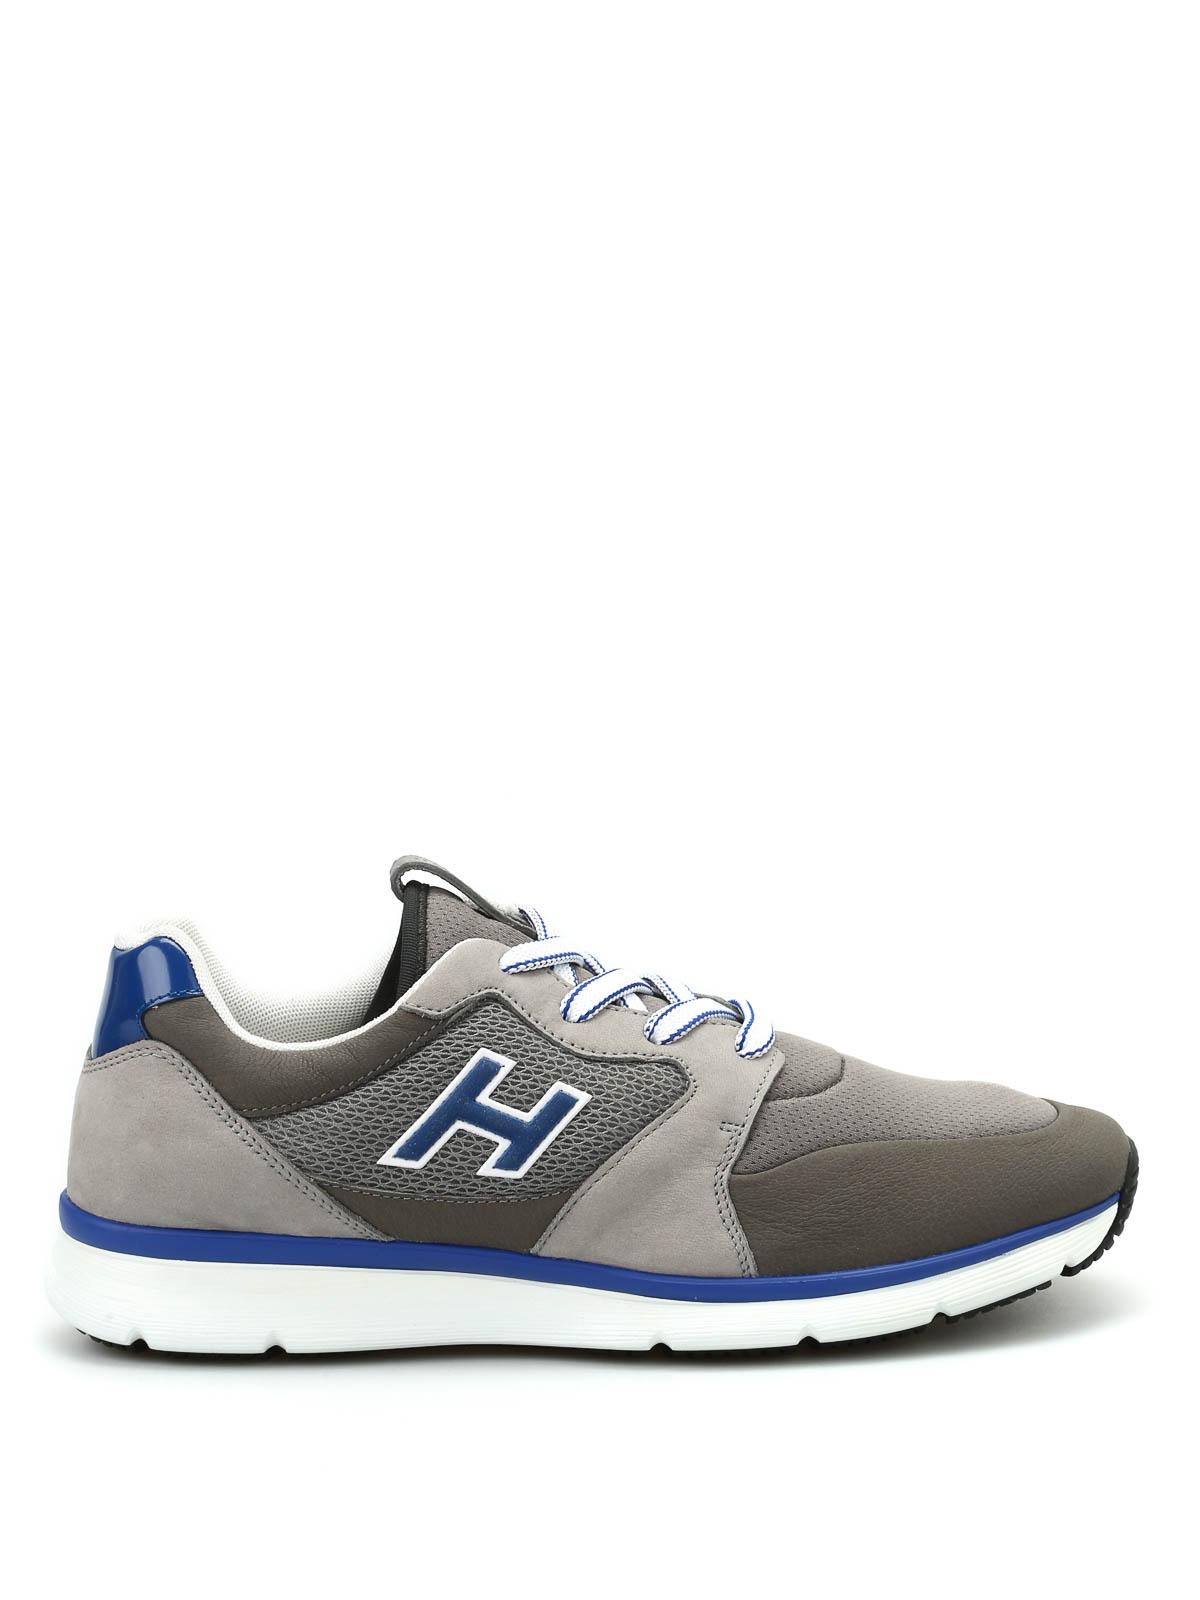 Hogan H254 New H Flock sneakers اسپرت،اسنیکرز